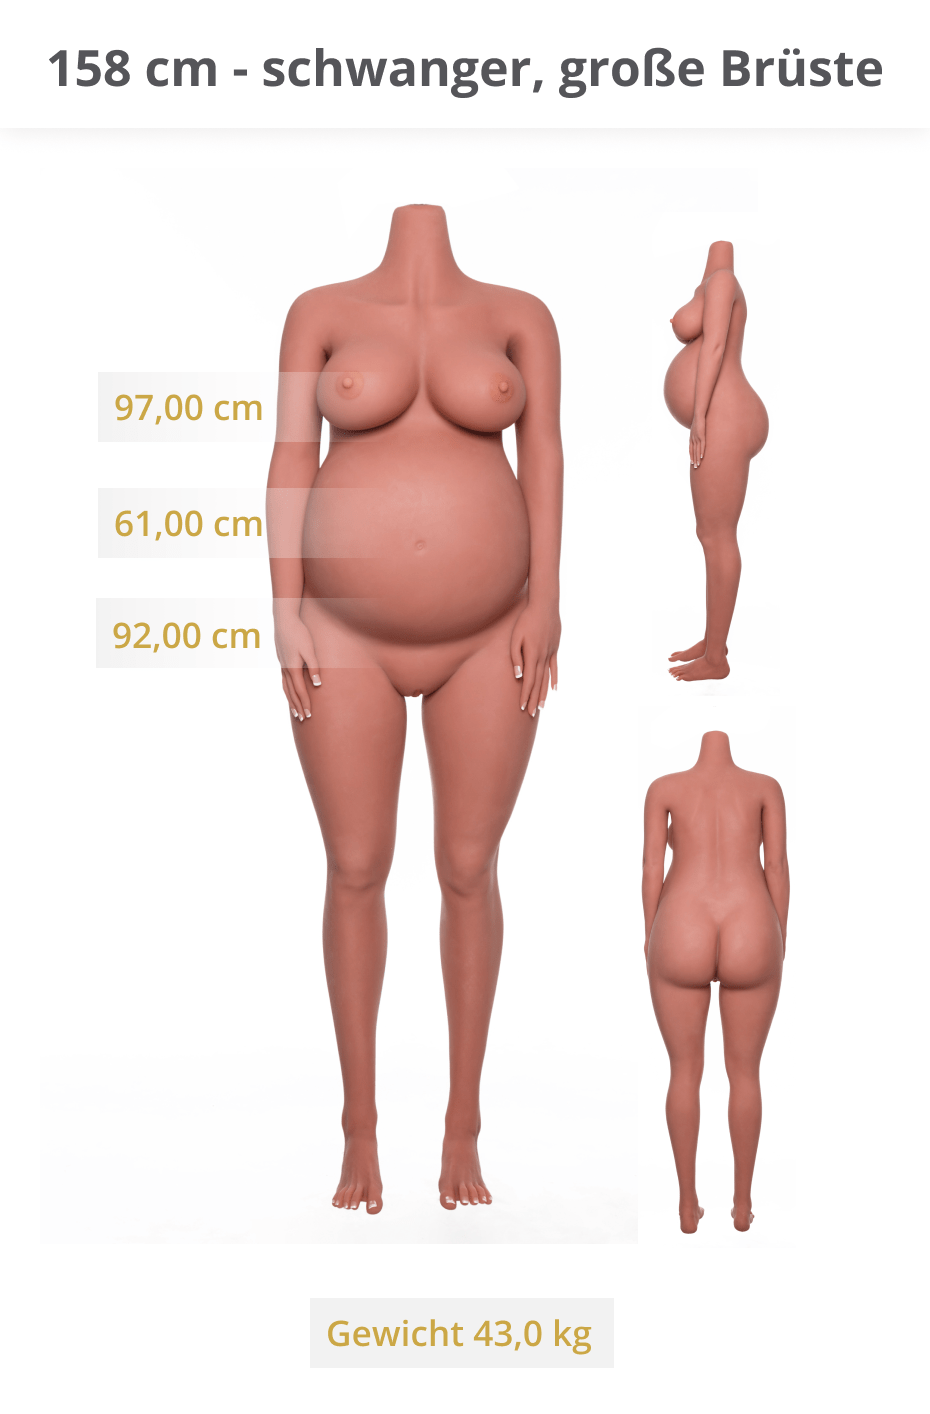 158-cm-schwanger-grosse-Bruste